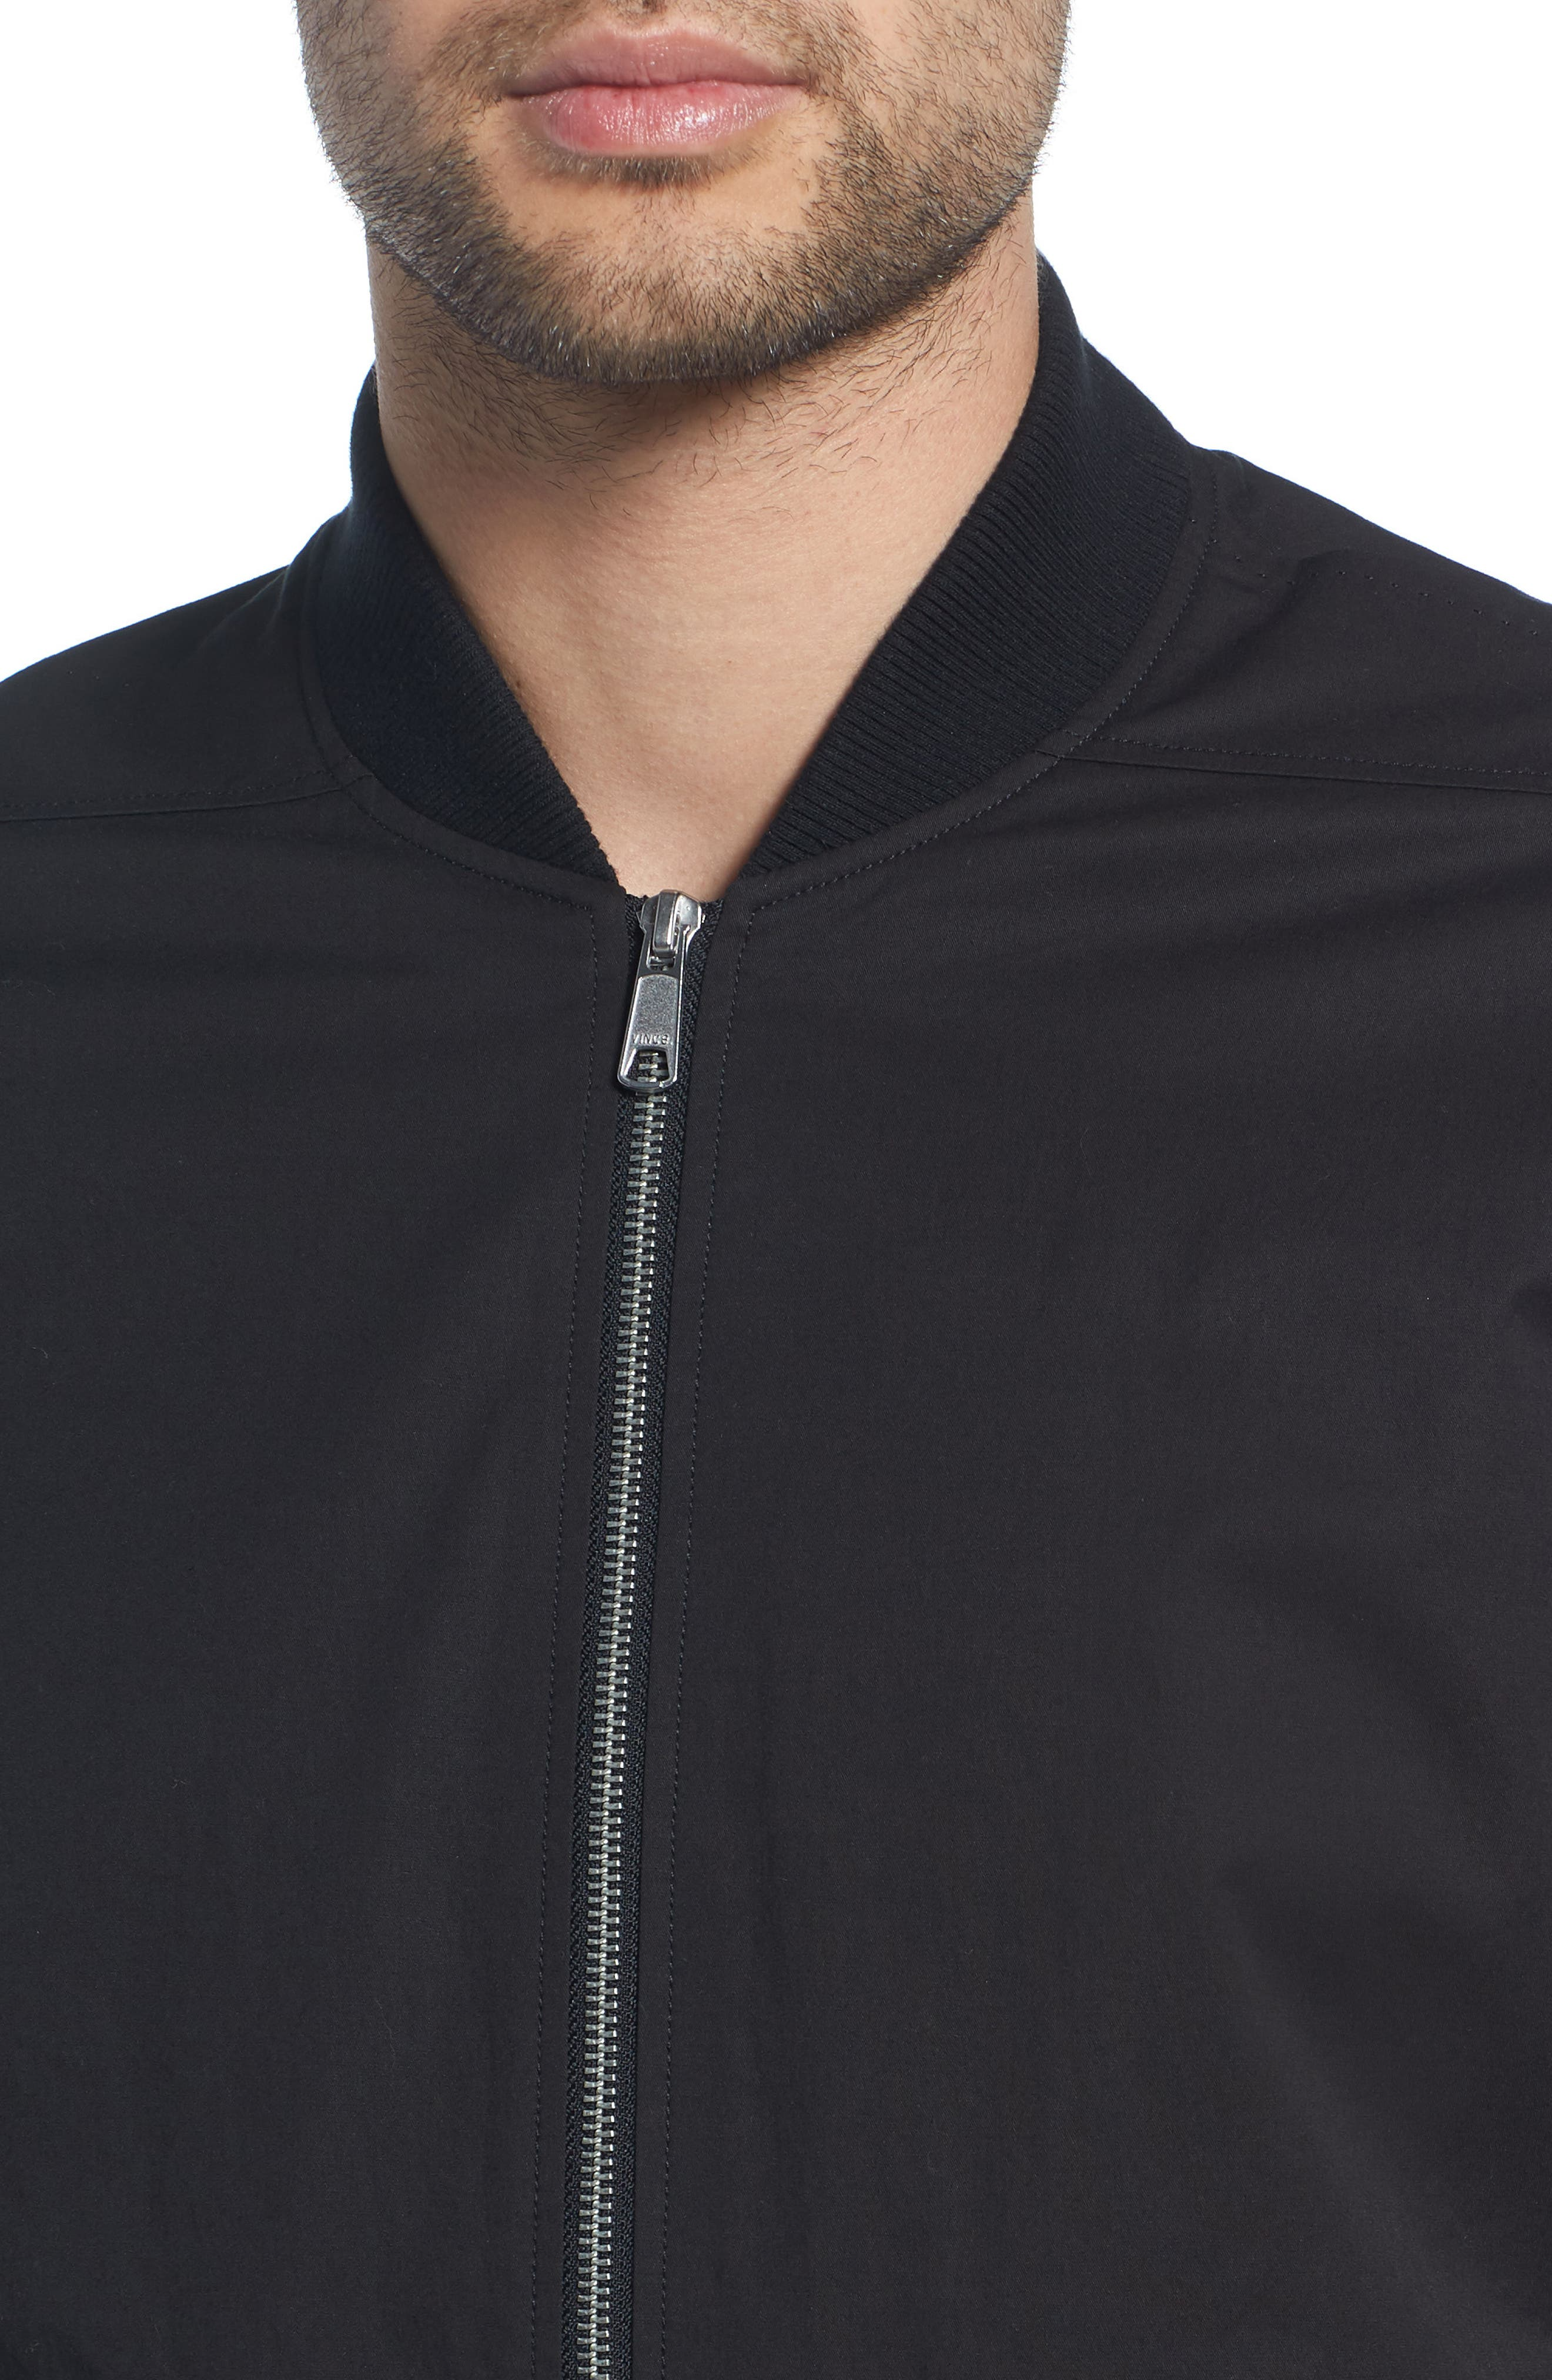 Regular Fit Bomber Jacket,                             Alternate thumbnail 4, color,                             BLACK